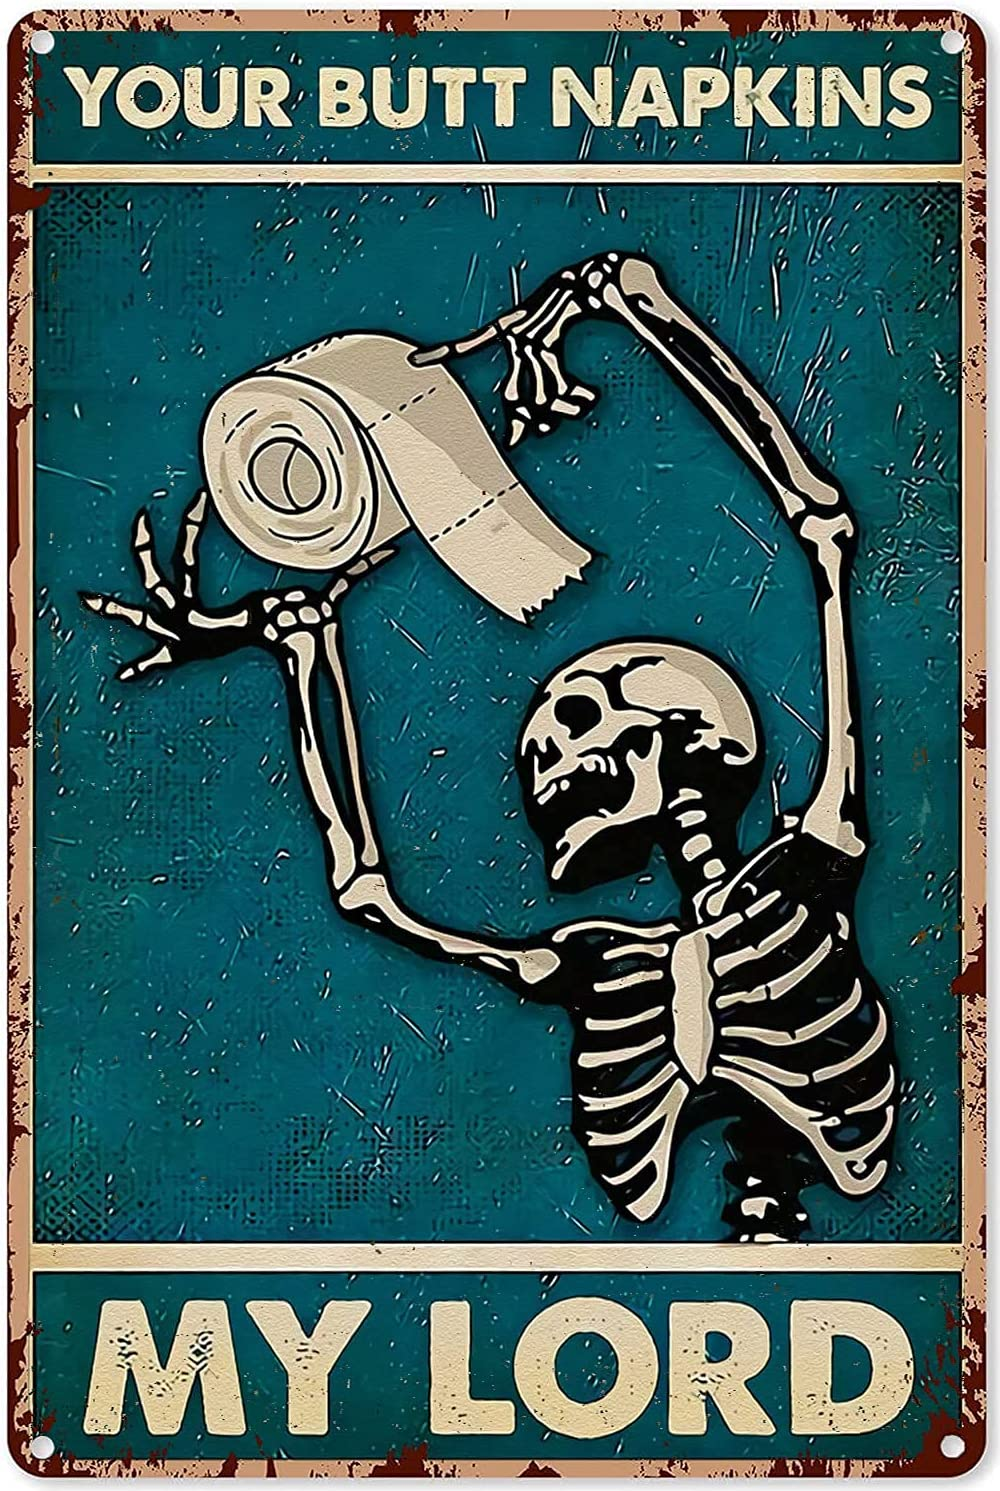 pladderman Funny Decor for Bathroom Your M Butt Skeleton Napkins Max 48% OFF Limited time sale